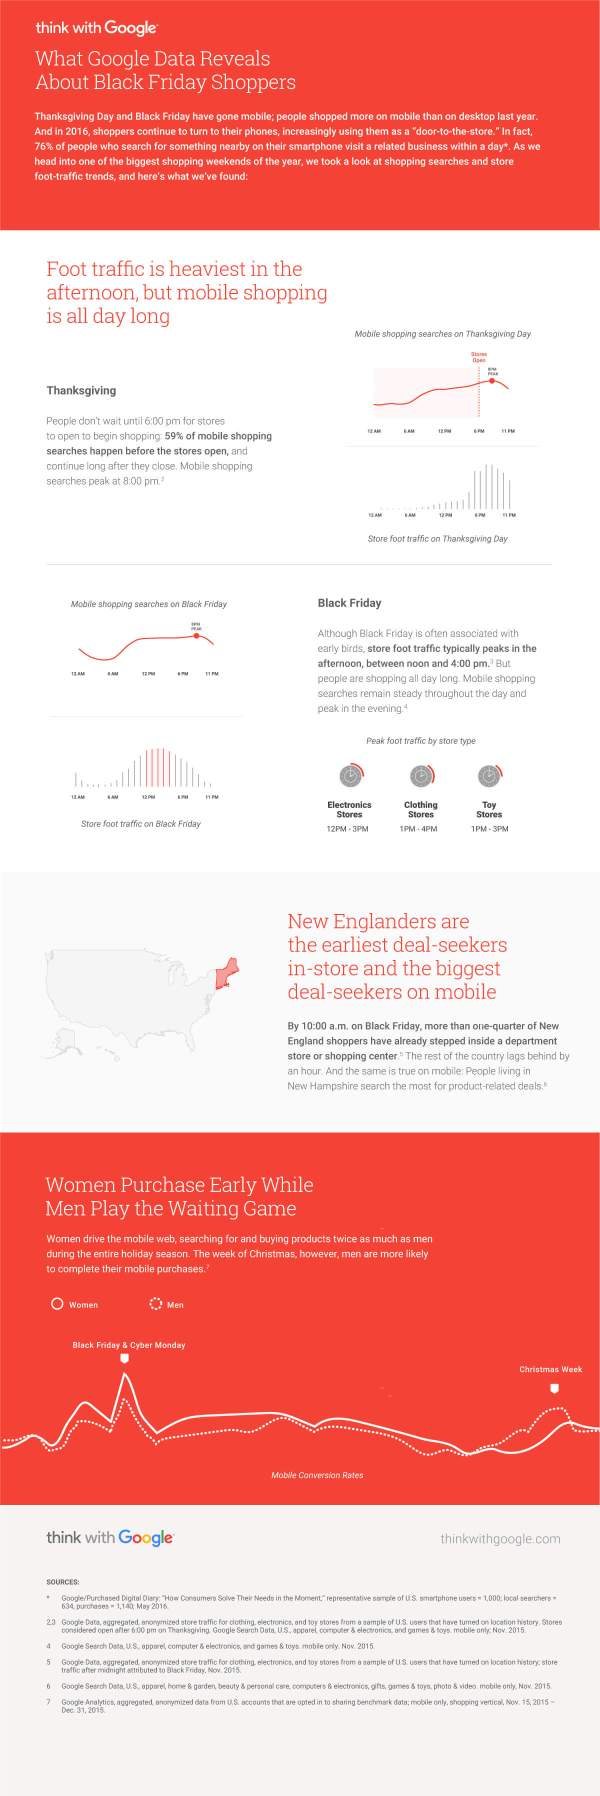 infographic-google-black-friday-data